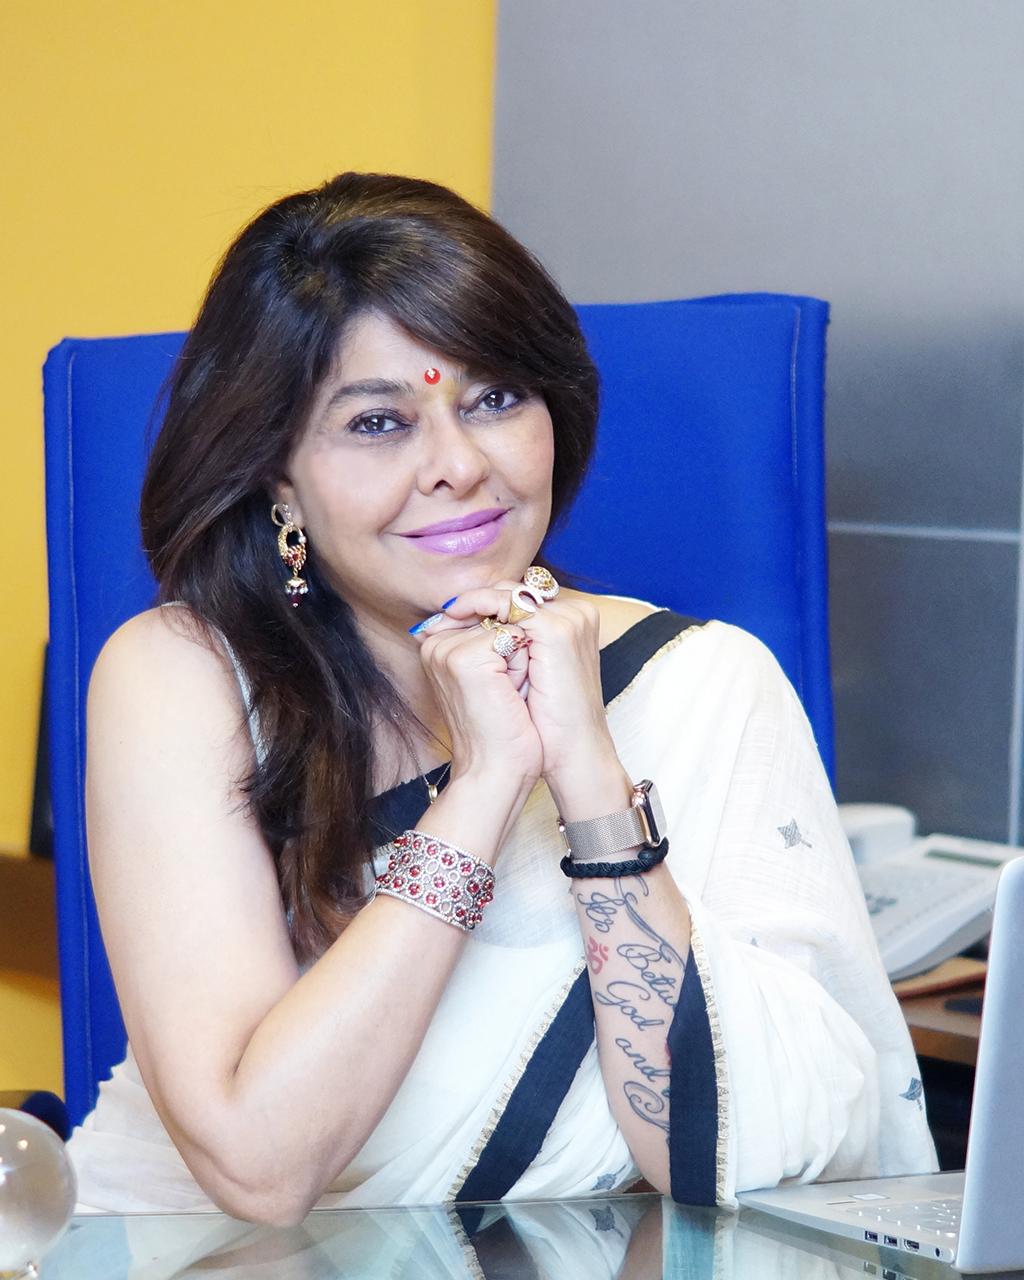 Dr. Tarita Shankar, Chairperson - Indira Group Of Institutes (IGI)